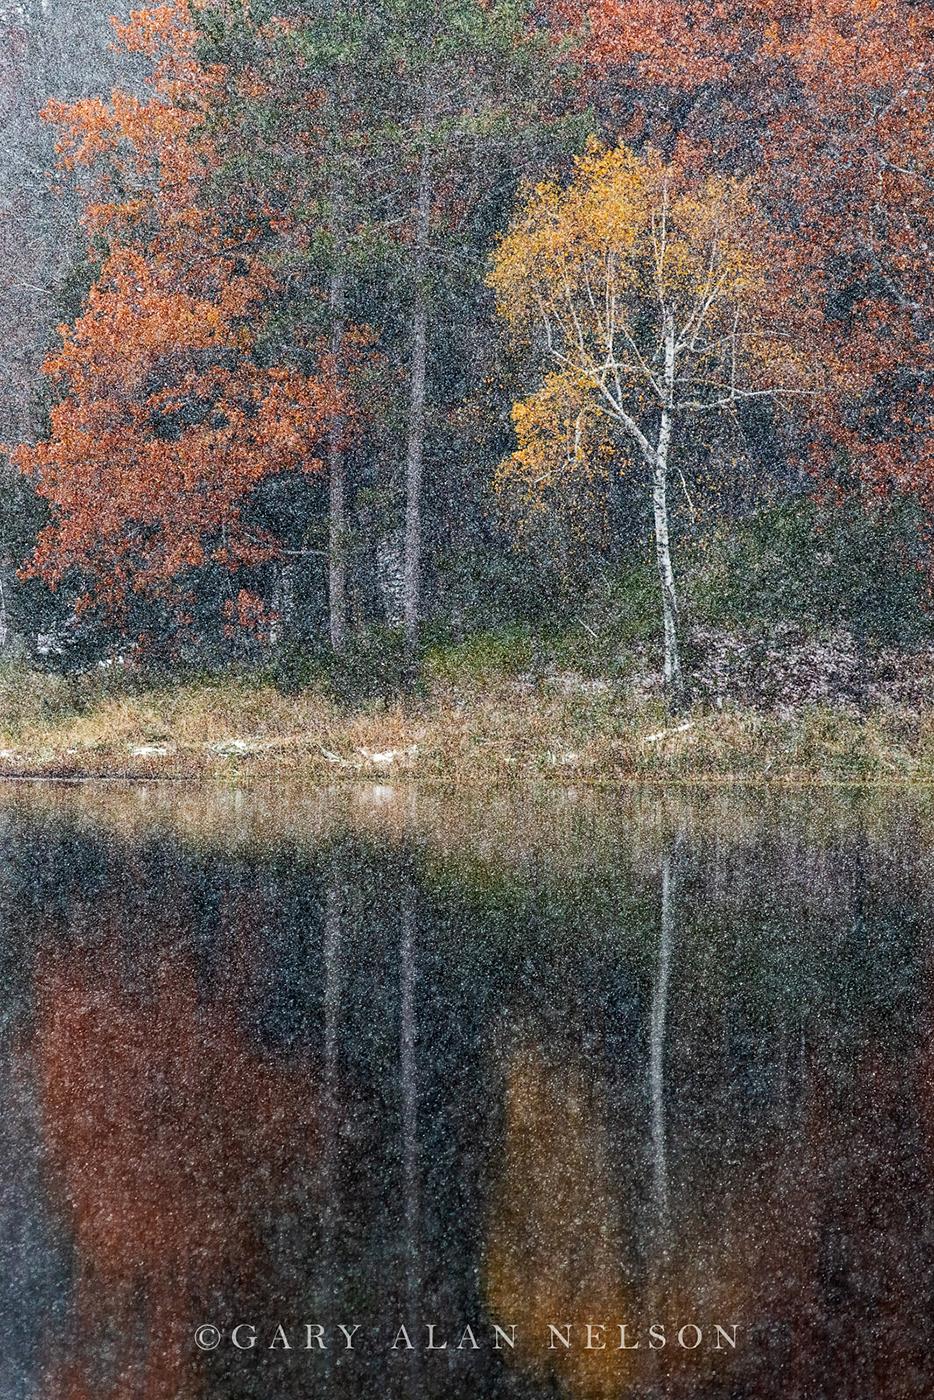 Autumn snowfall on Bull Lake, Allemansratt Park, Lindstrom, Minnesota